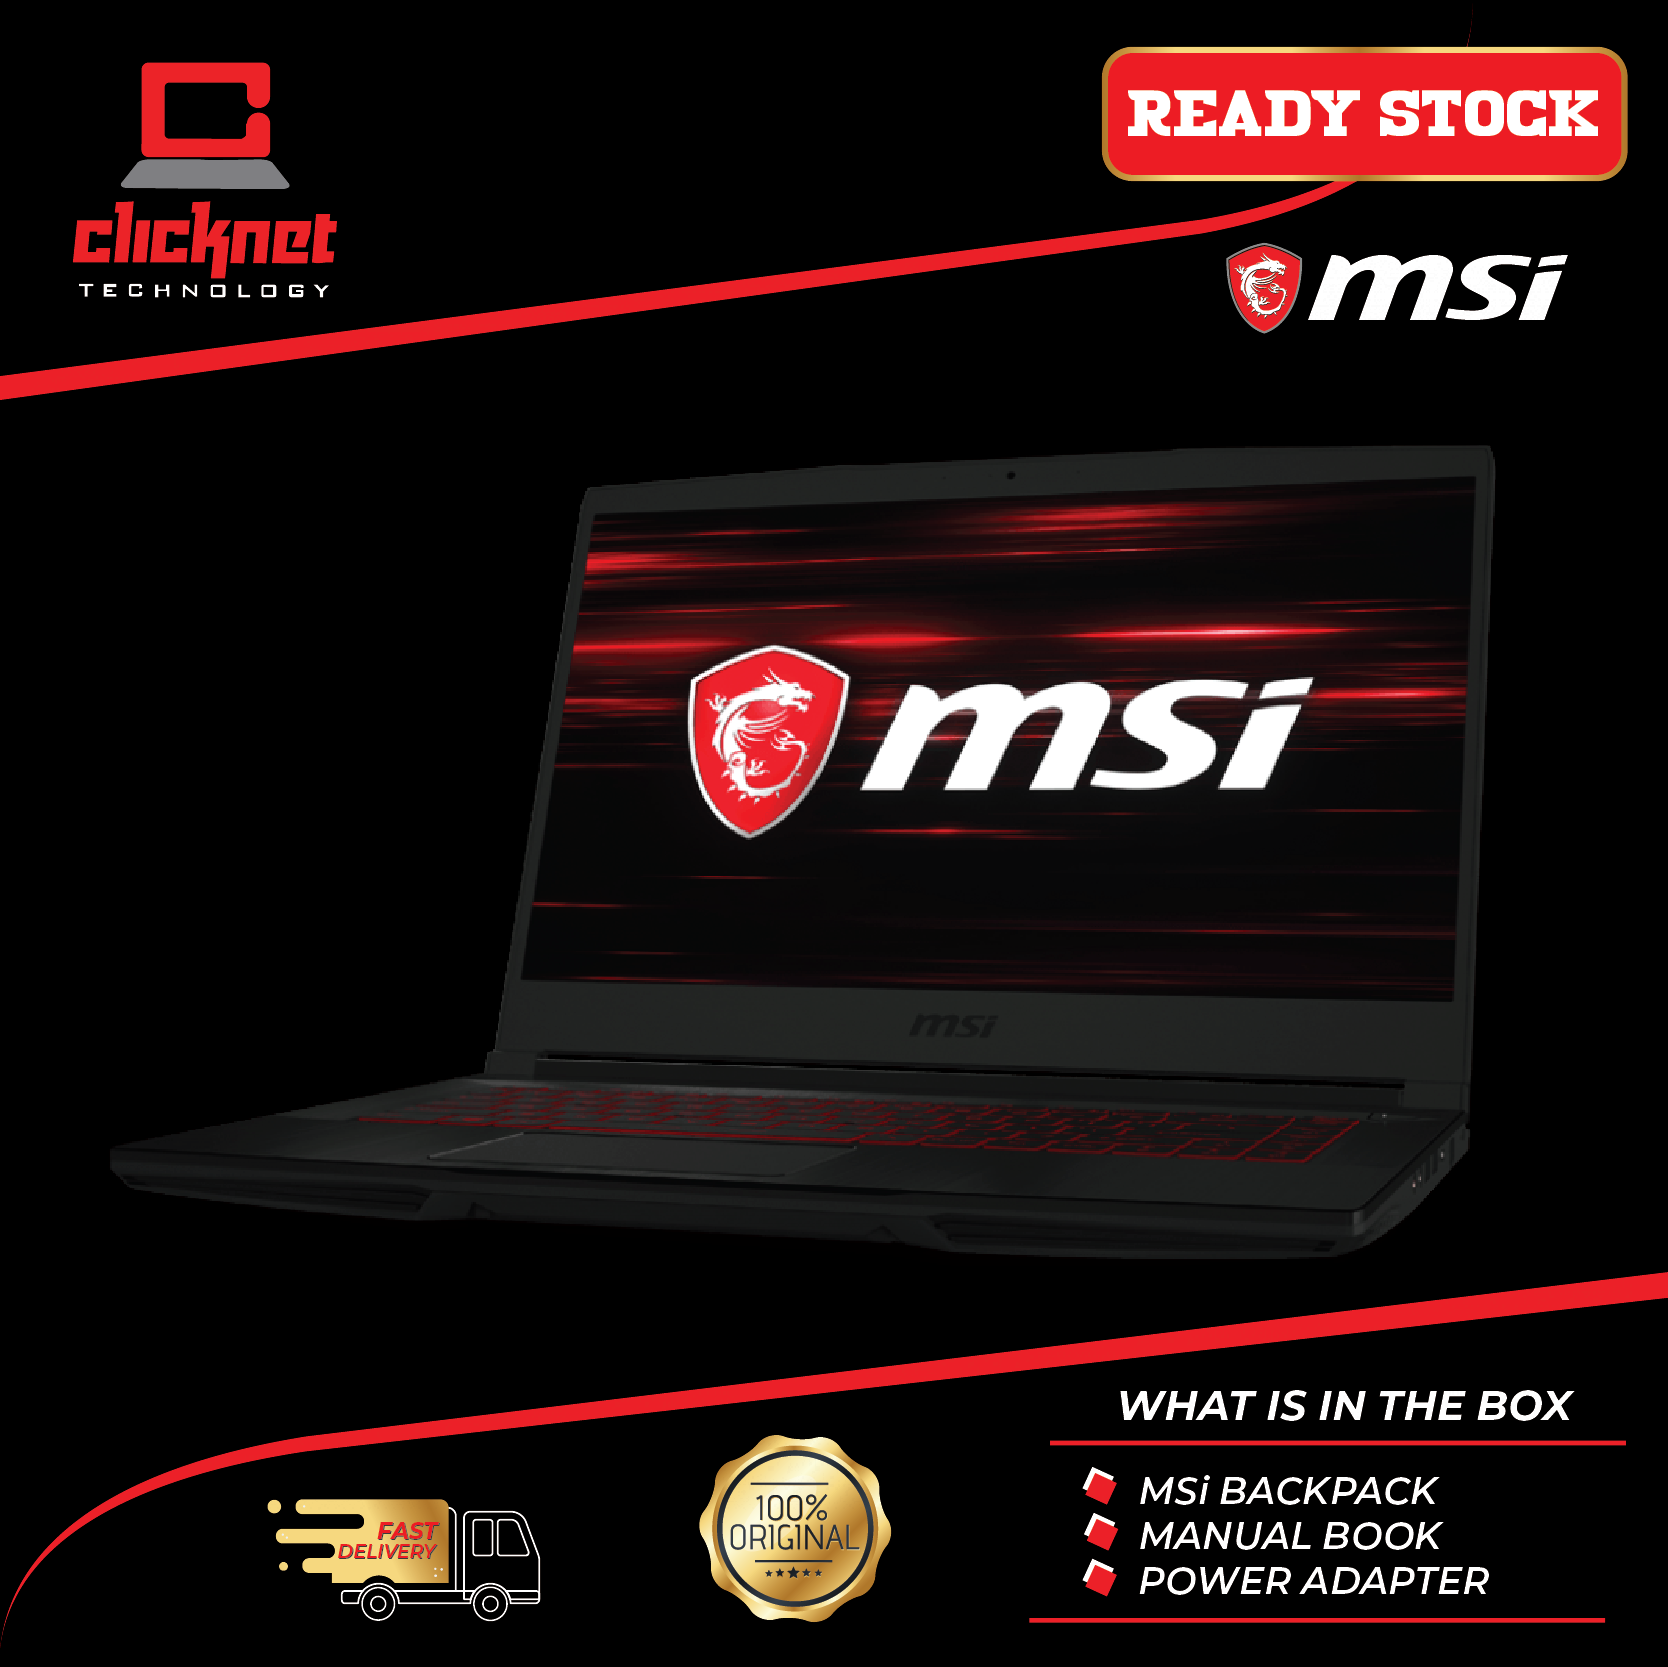 MSI GF63-9SC-634 15.6  FHD IPS Gaming Laptop BLK (i5-9300H 4GB 512GB GTX 1650 4GB MAX-Q 15.6FHD W10) Malaysia